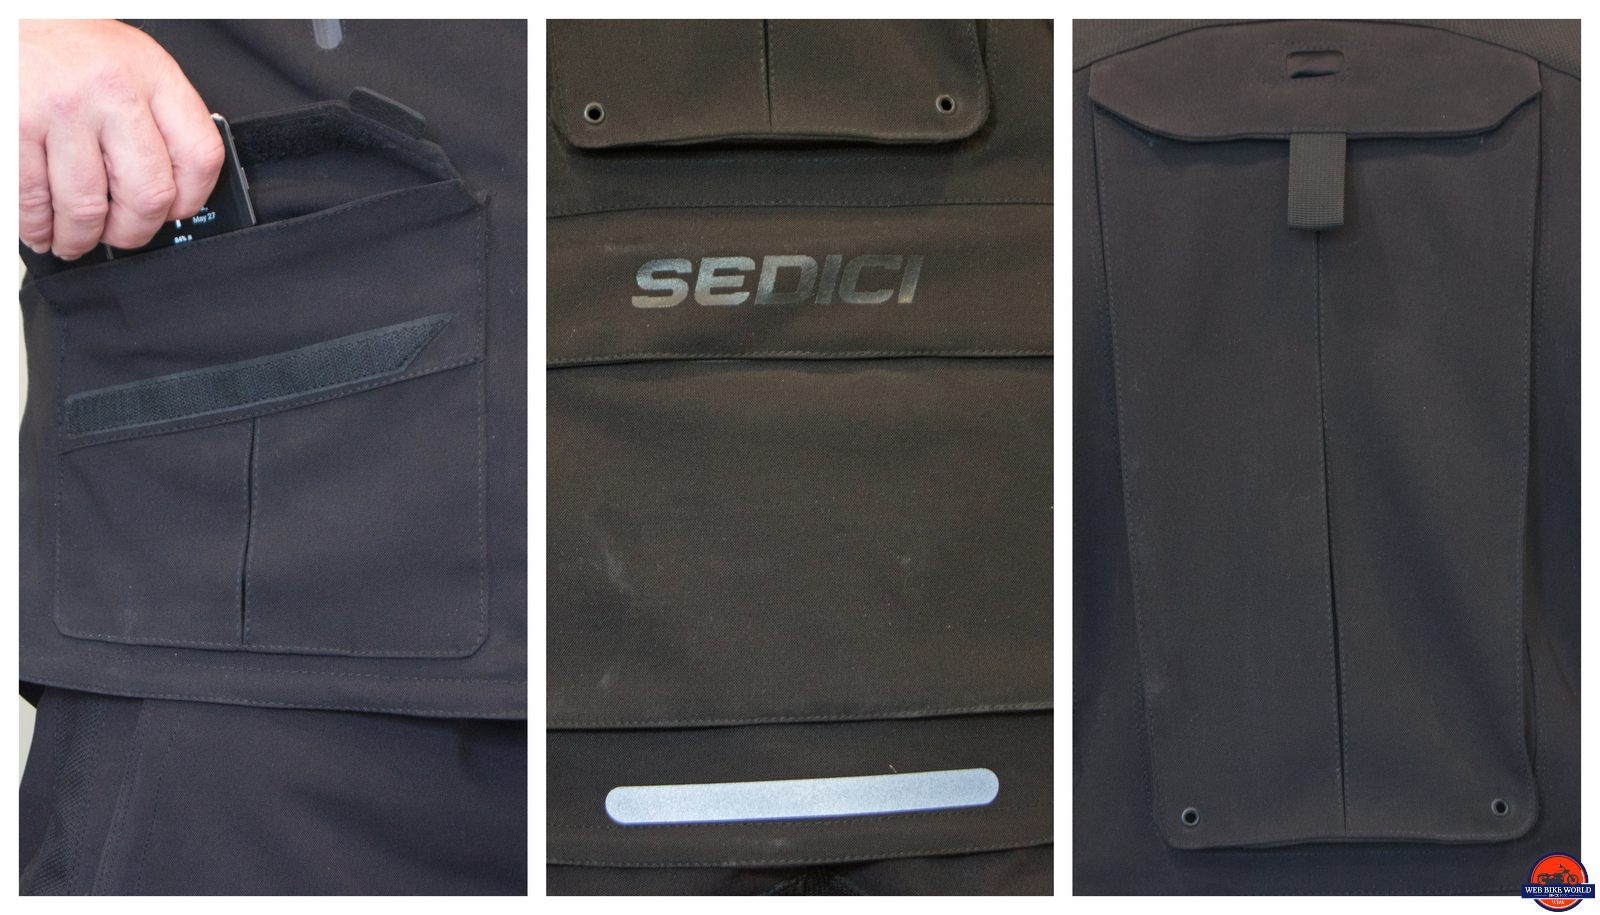 sedici garda exterior pockets